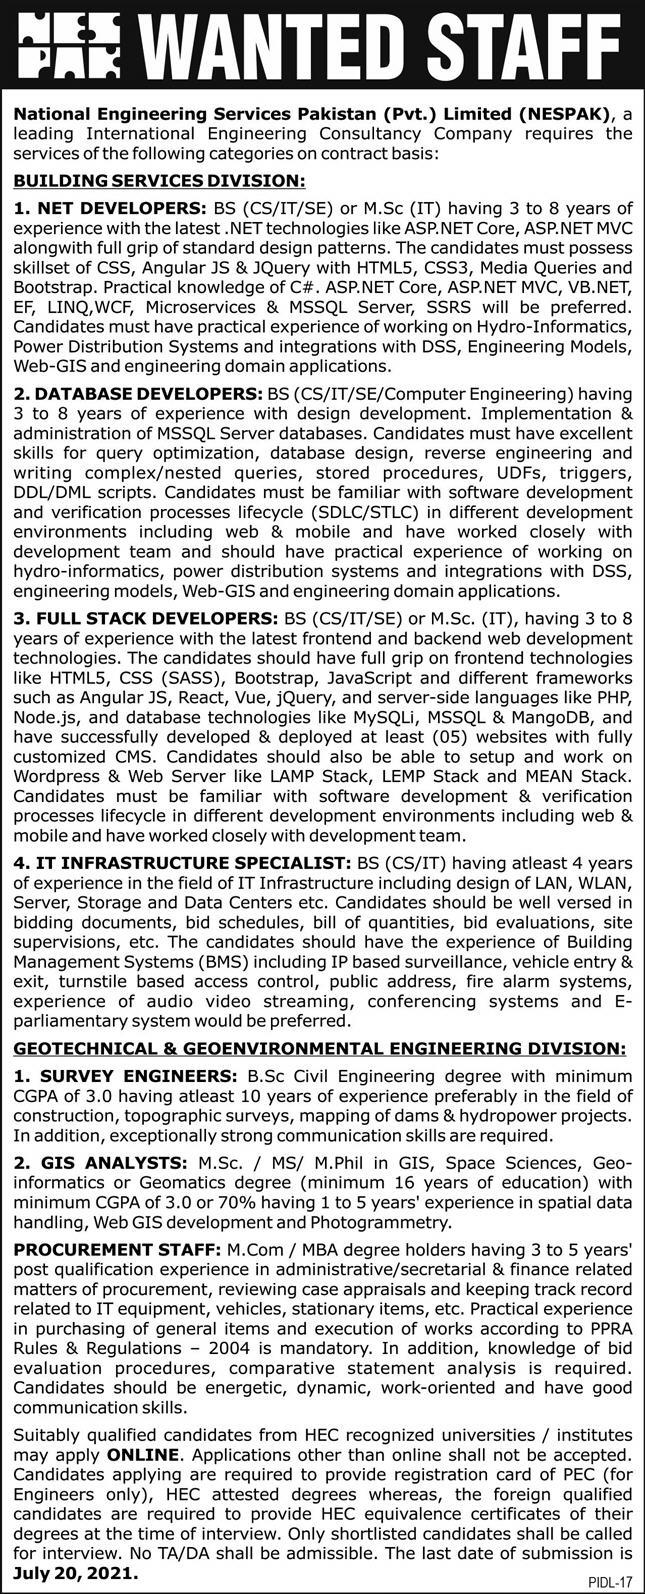 www.nespak.com.pk Jobs 2021 - National Engineering Services Pakistan Private Limited (NESPAK) Jobs 2021 in Pakistan